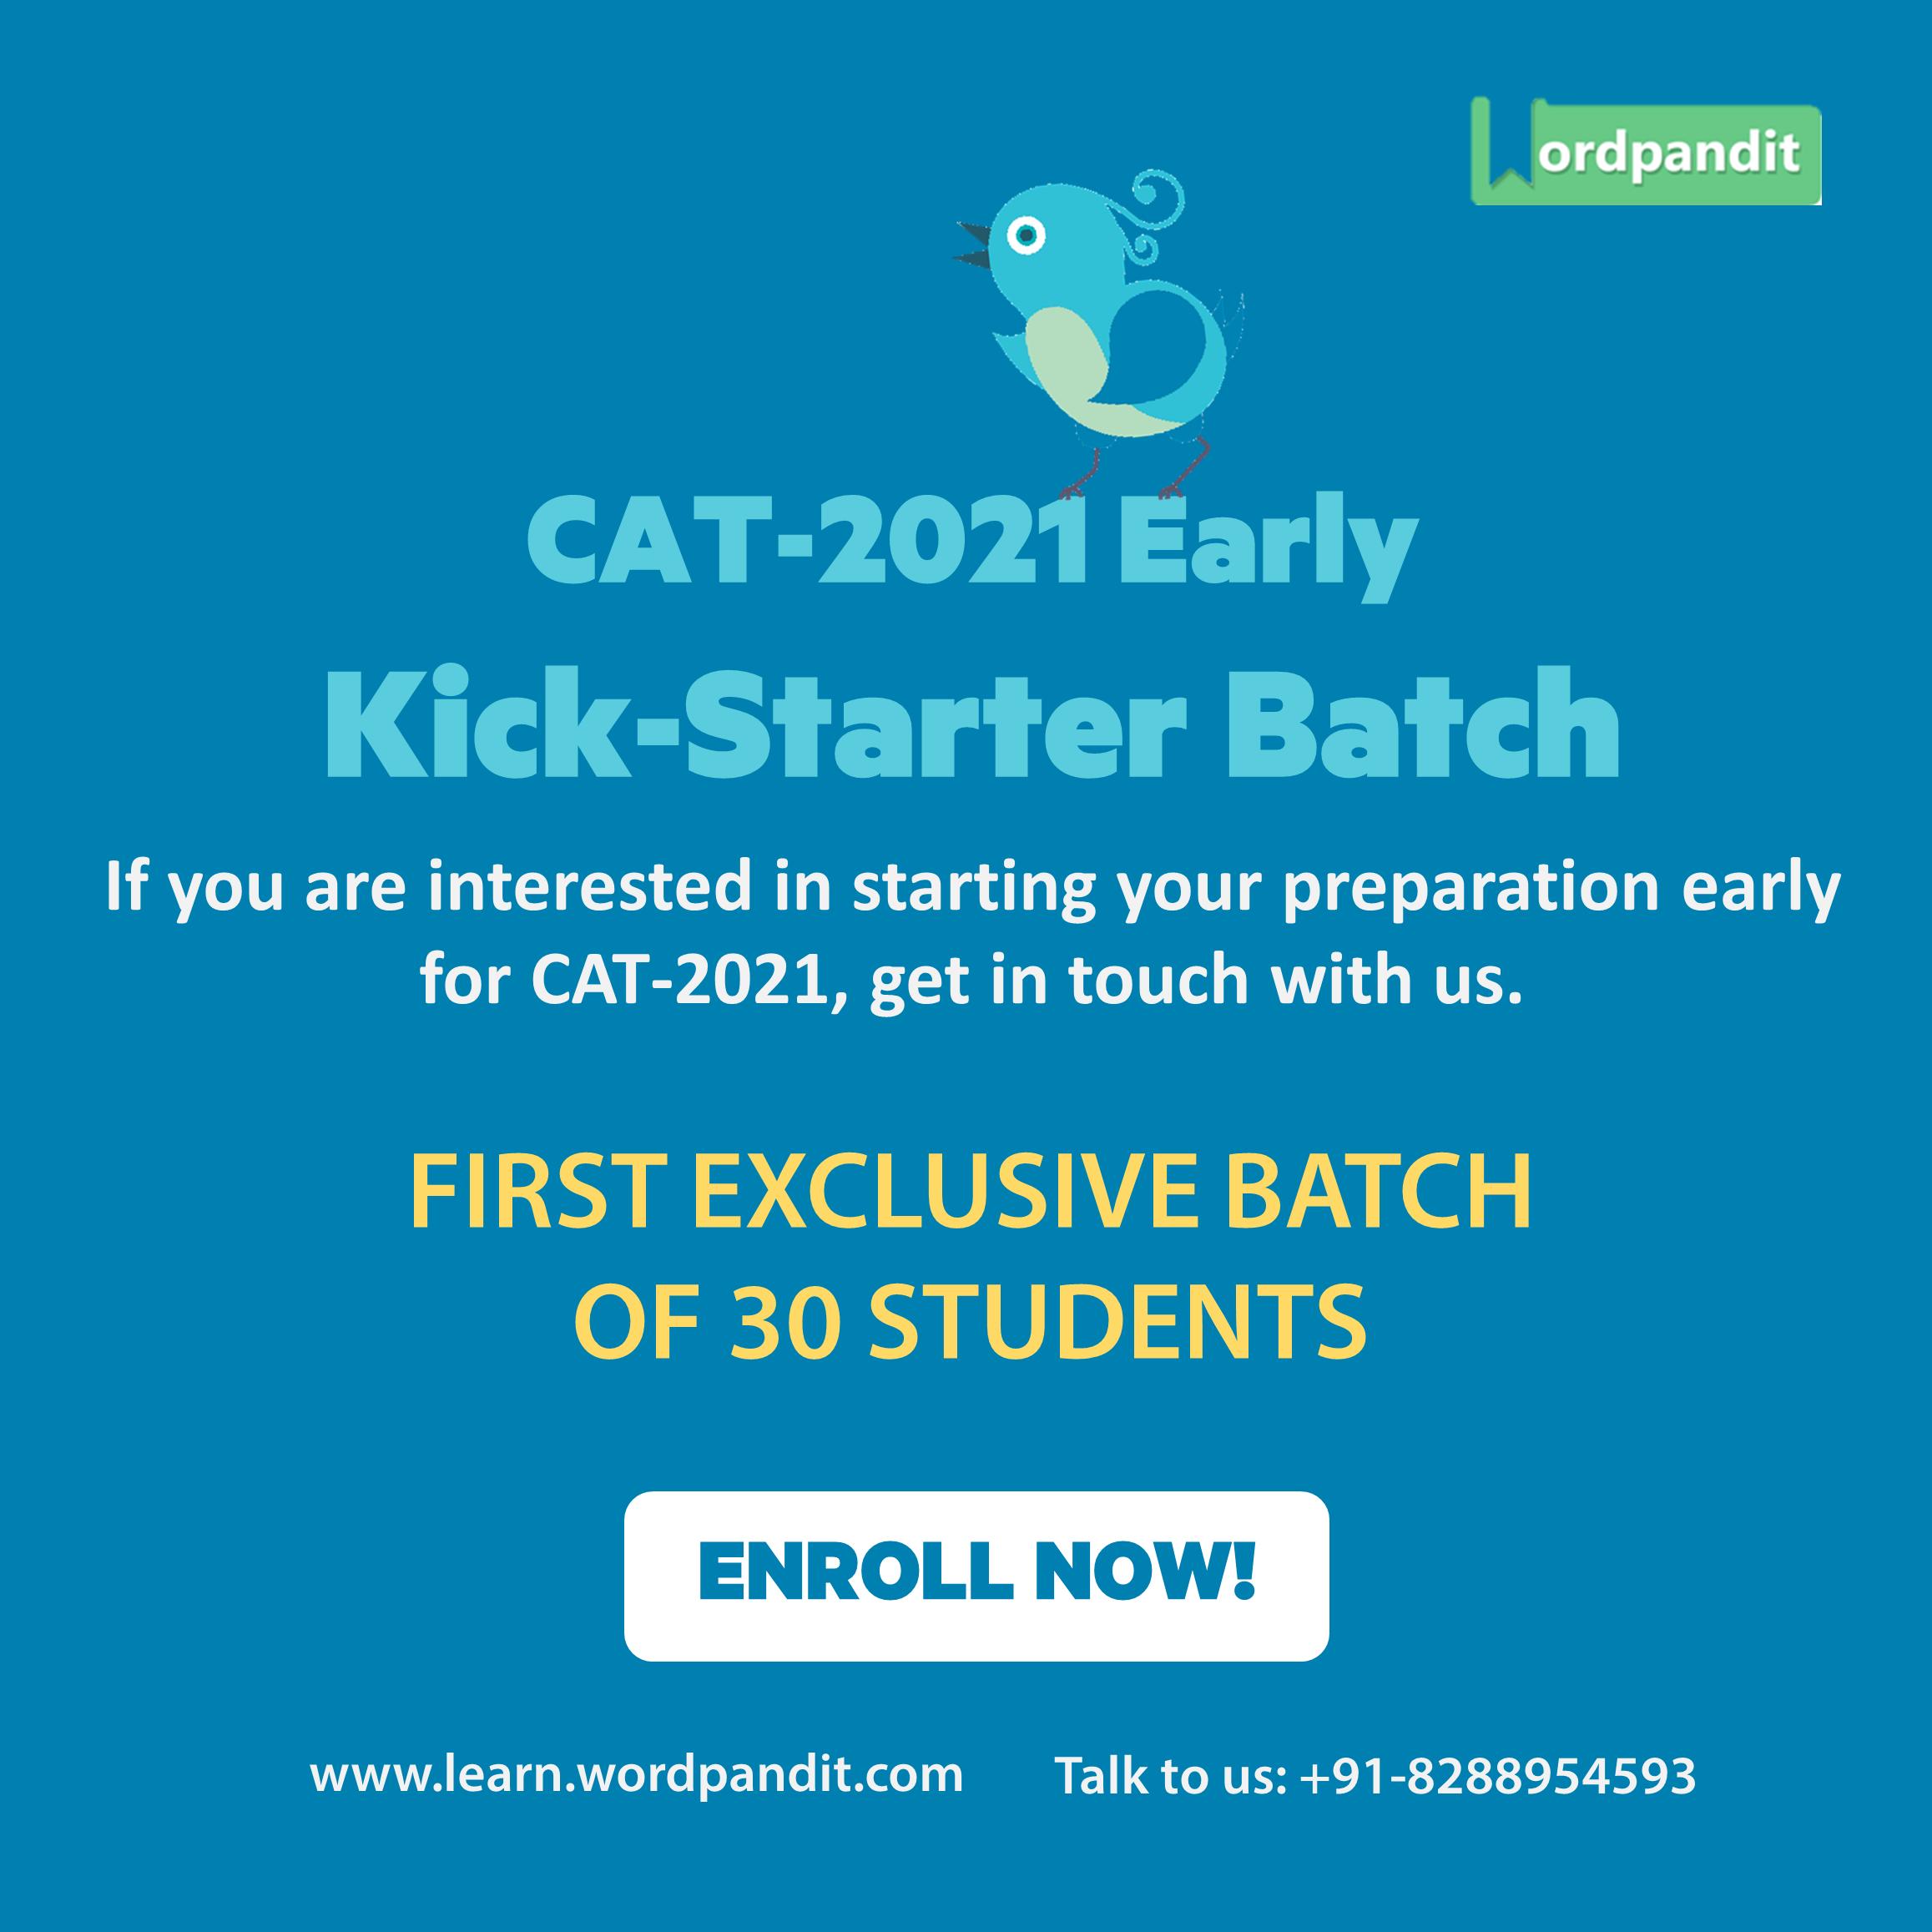 Wordpandit CAT2021 Early KickStarter Batch If you are